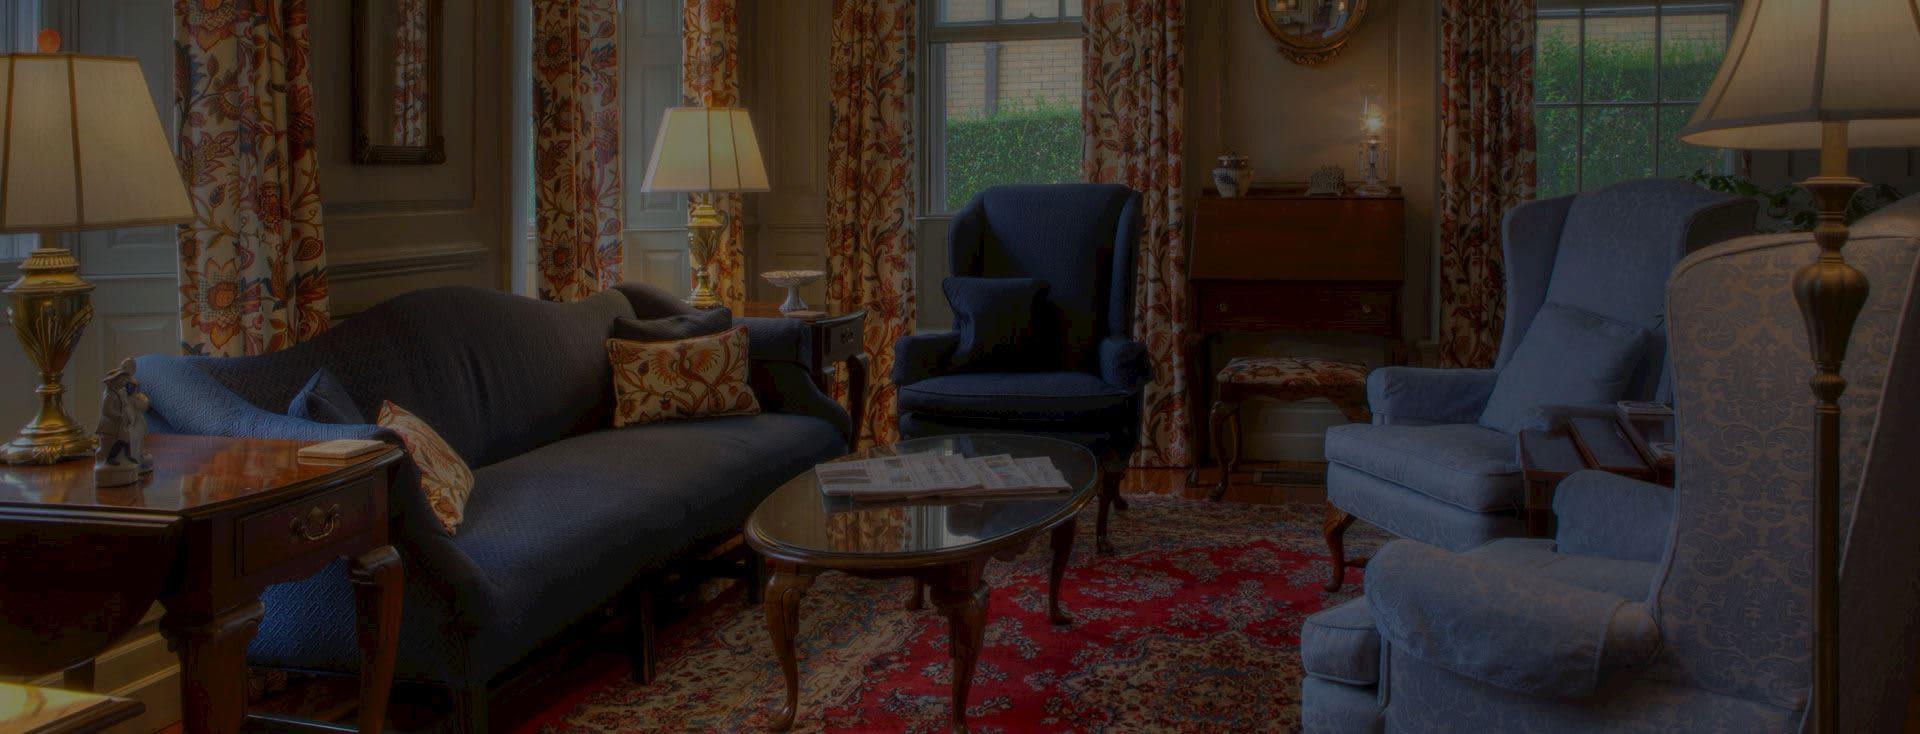 The Francis Malbone House Newport Main Room